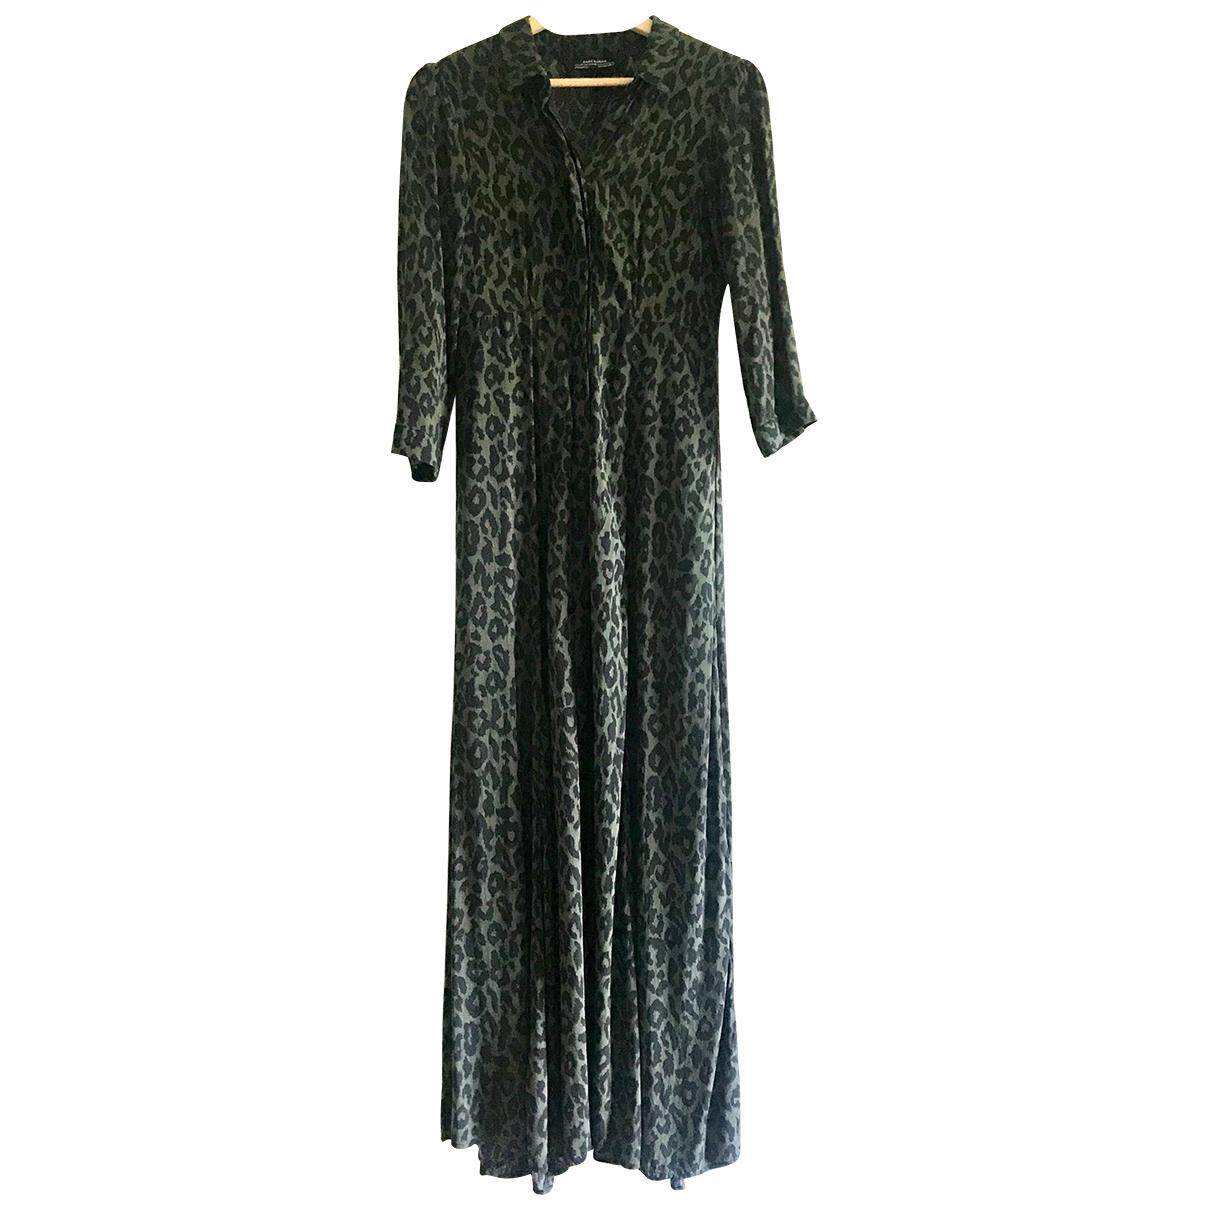 Zara \N Khaki Cotton dress for Women 6 UK